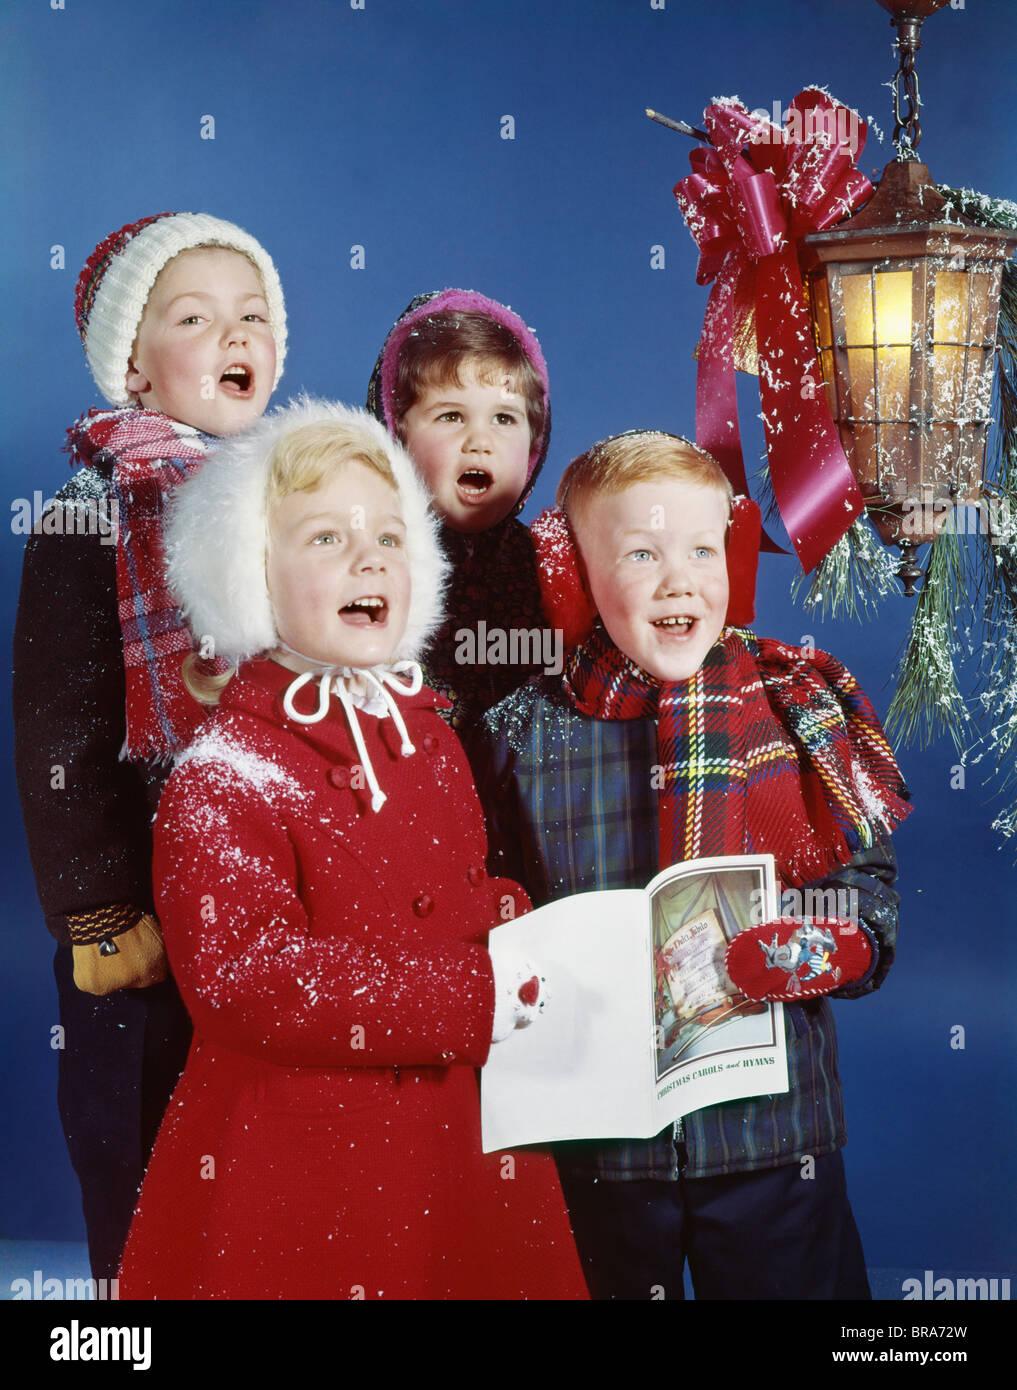 1960 1960s RETRO CHILDREN SINGING CAROLS LAMP CAROLERS